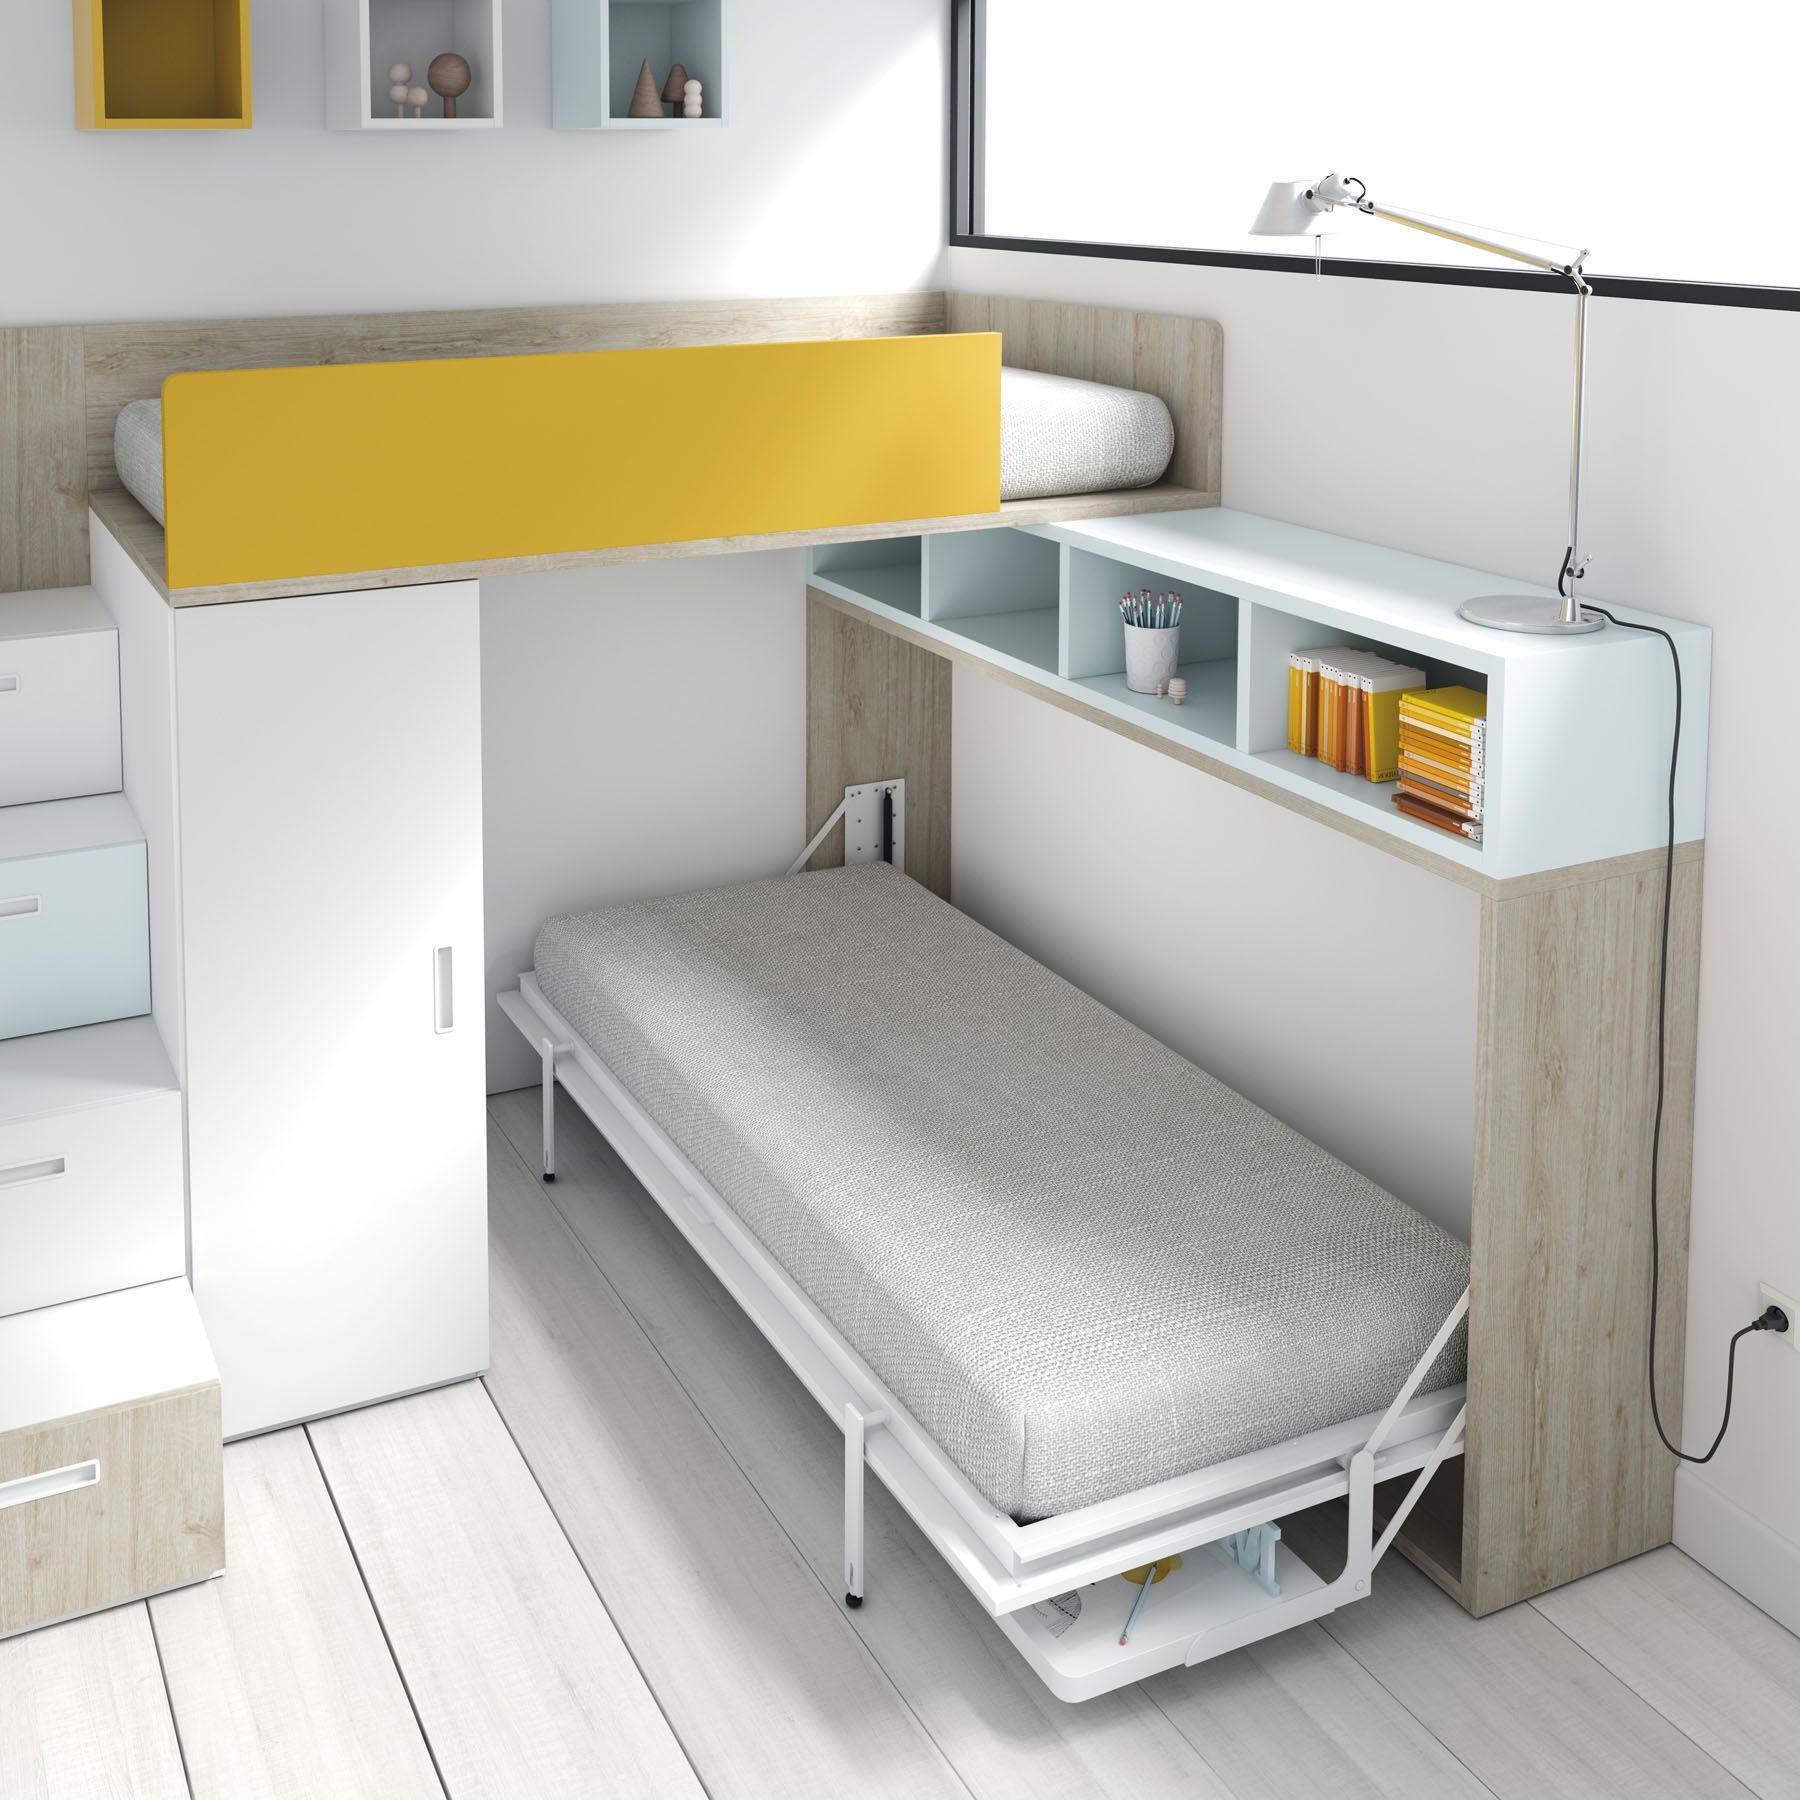 Cama Escritorio Abatible Ikea 9ddf Camas Tren Y Blocs Qb by Tegarmobel Tiny Houses Pinterest